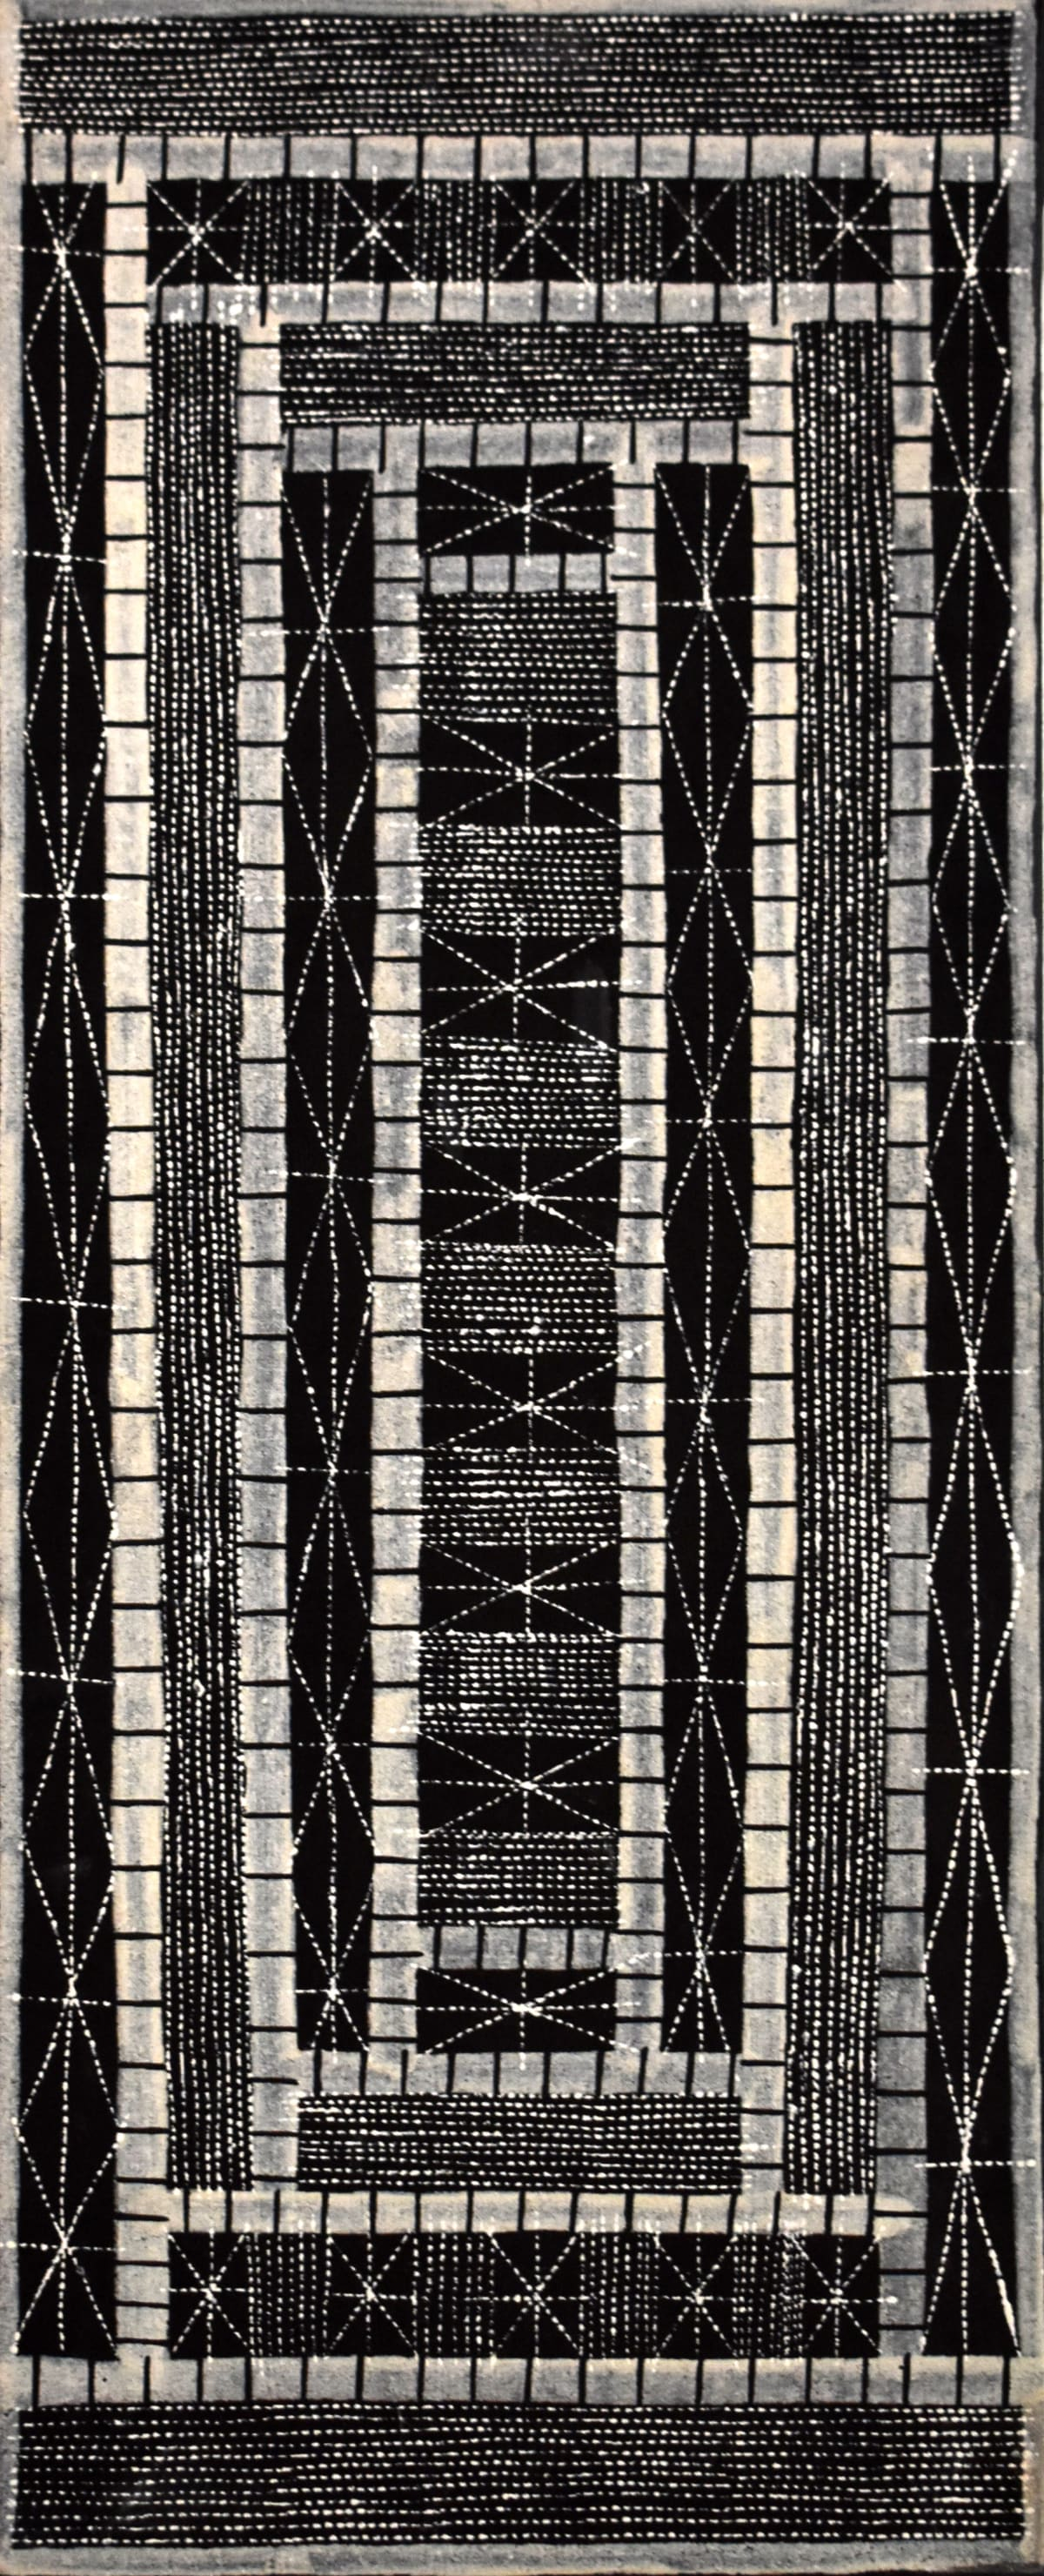 Pedro Wonaeamirri Jilamara natural ochres on linen 80 x 30 cm